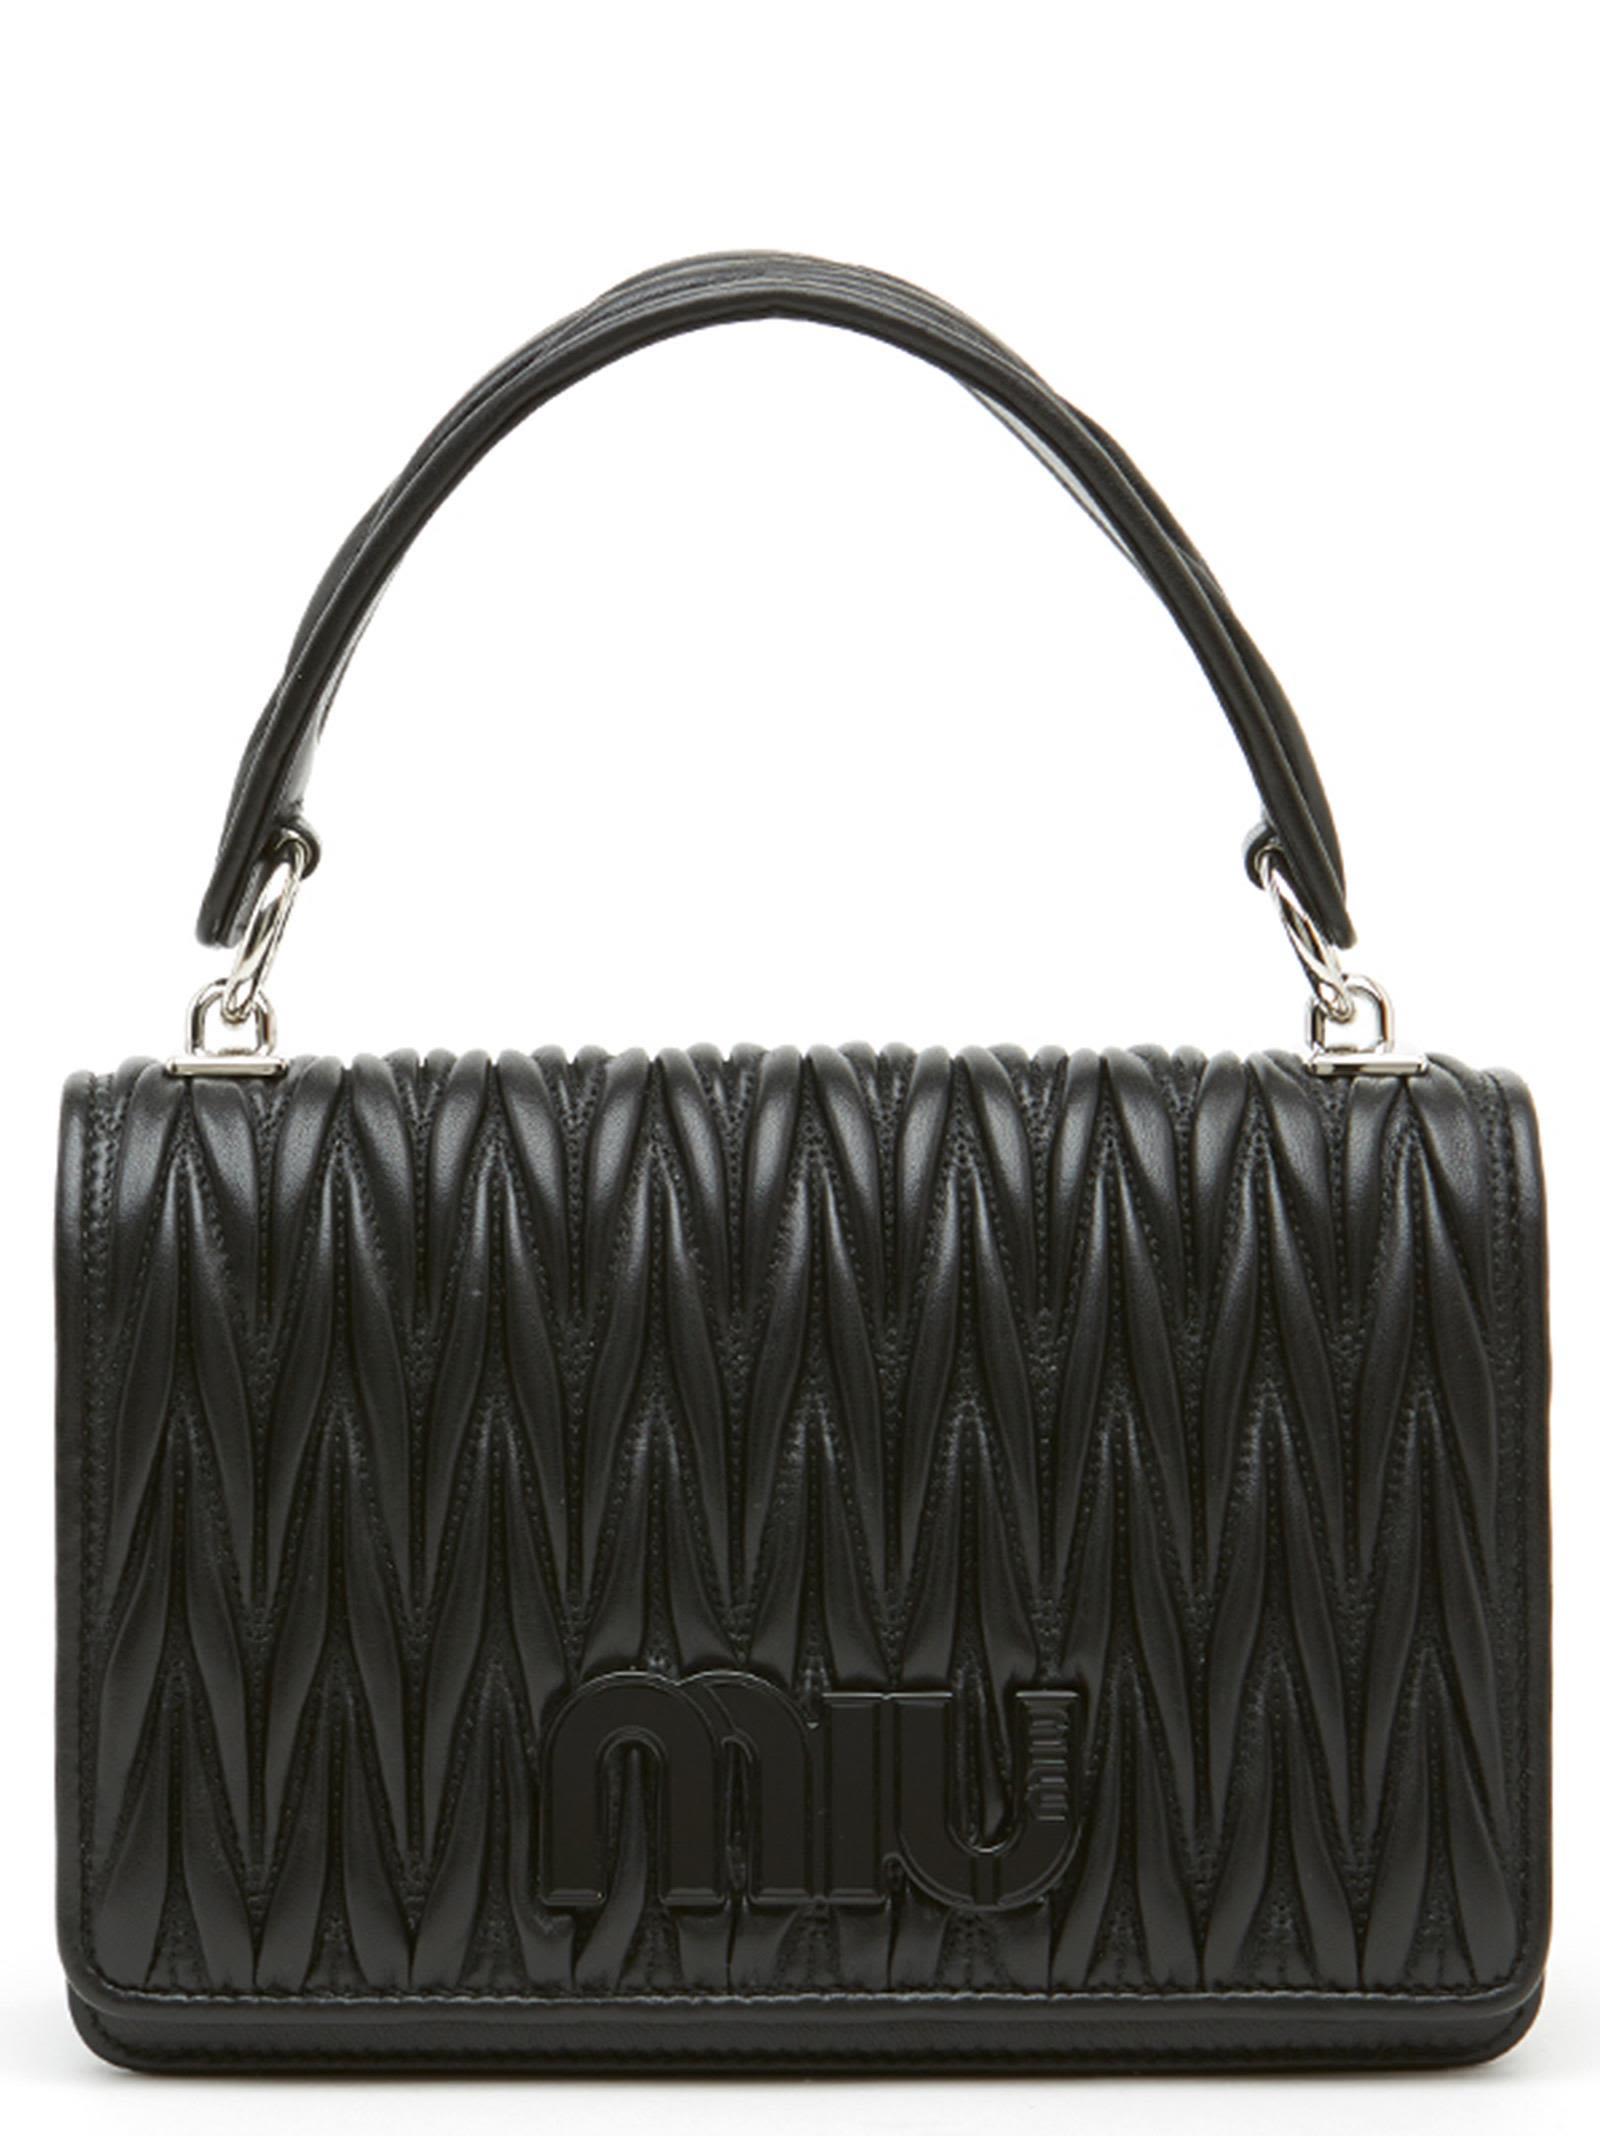 41cabe9b61b Miu Miu Bag - Black ...